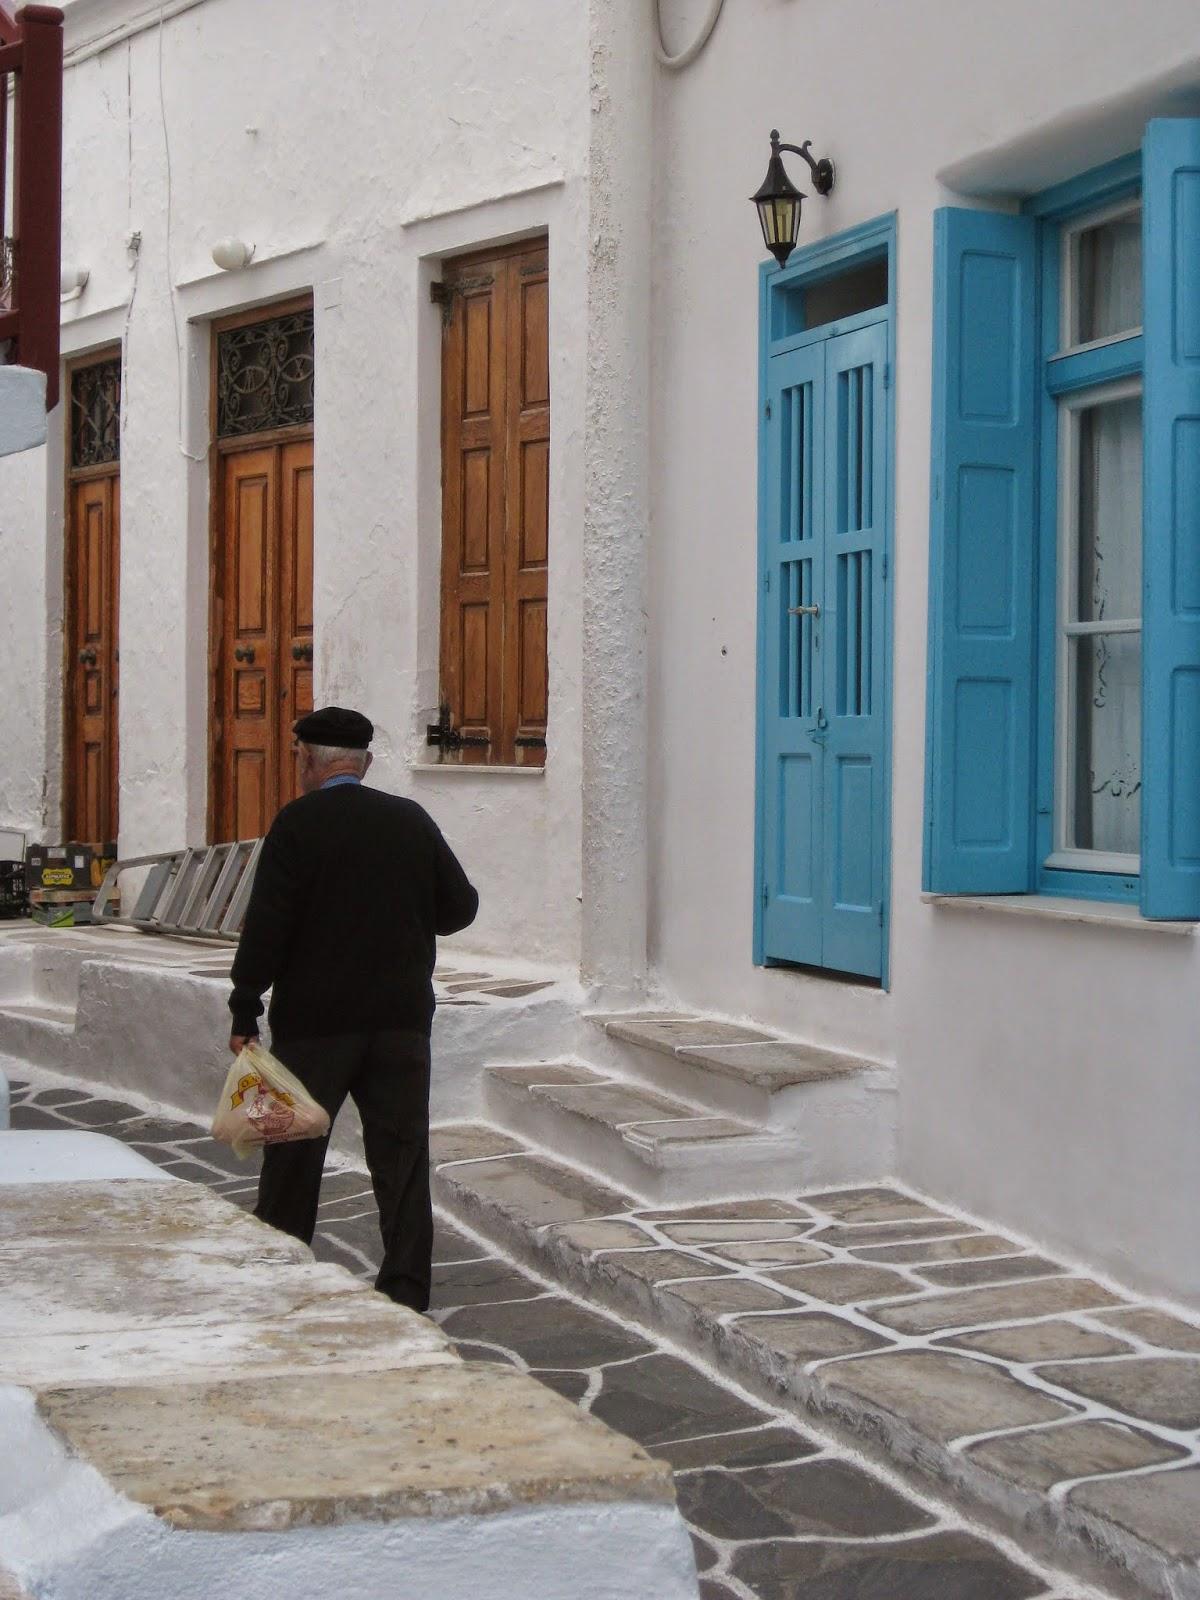 Mykonos - Exploring the windy streets